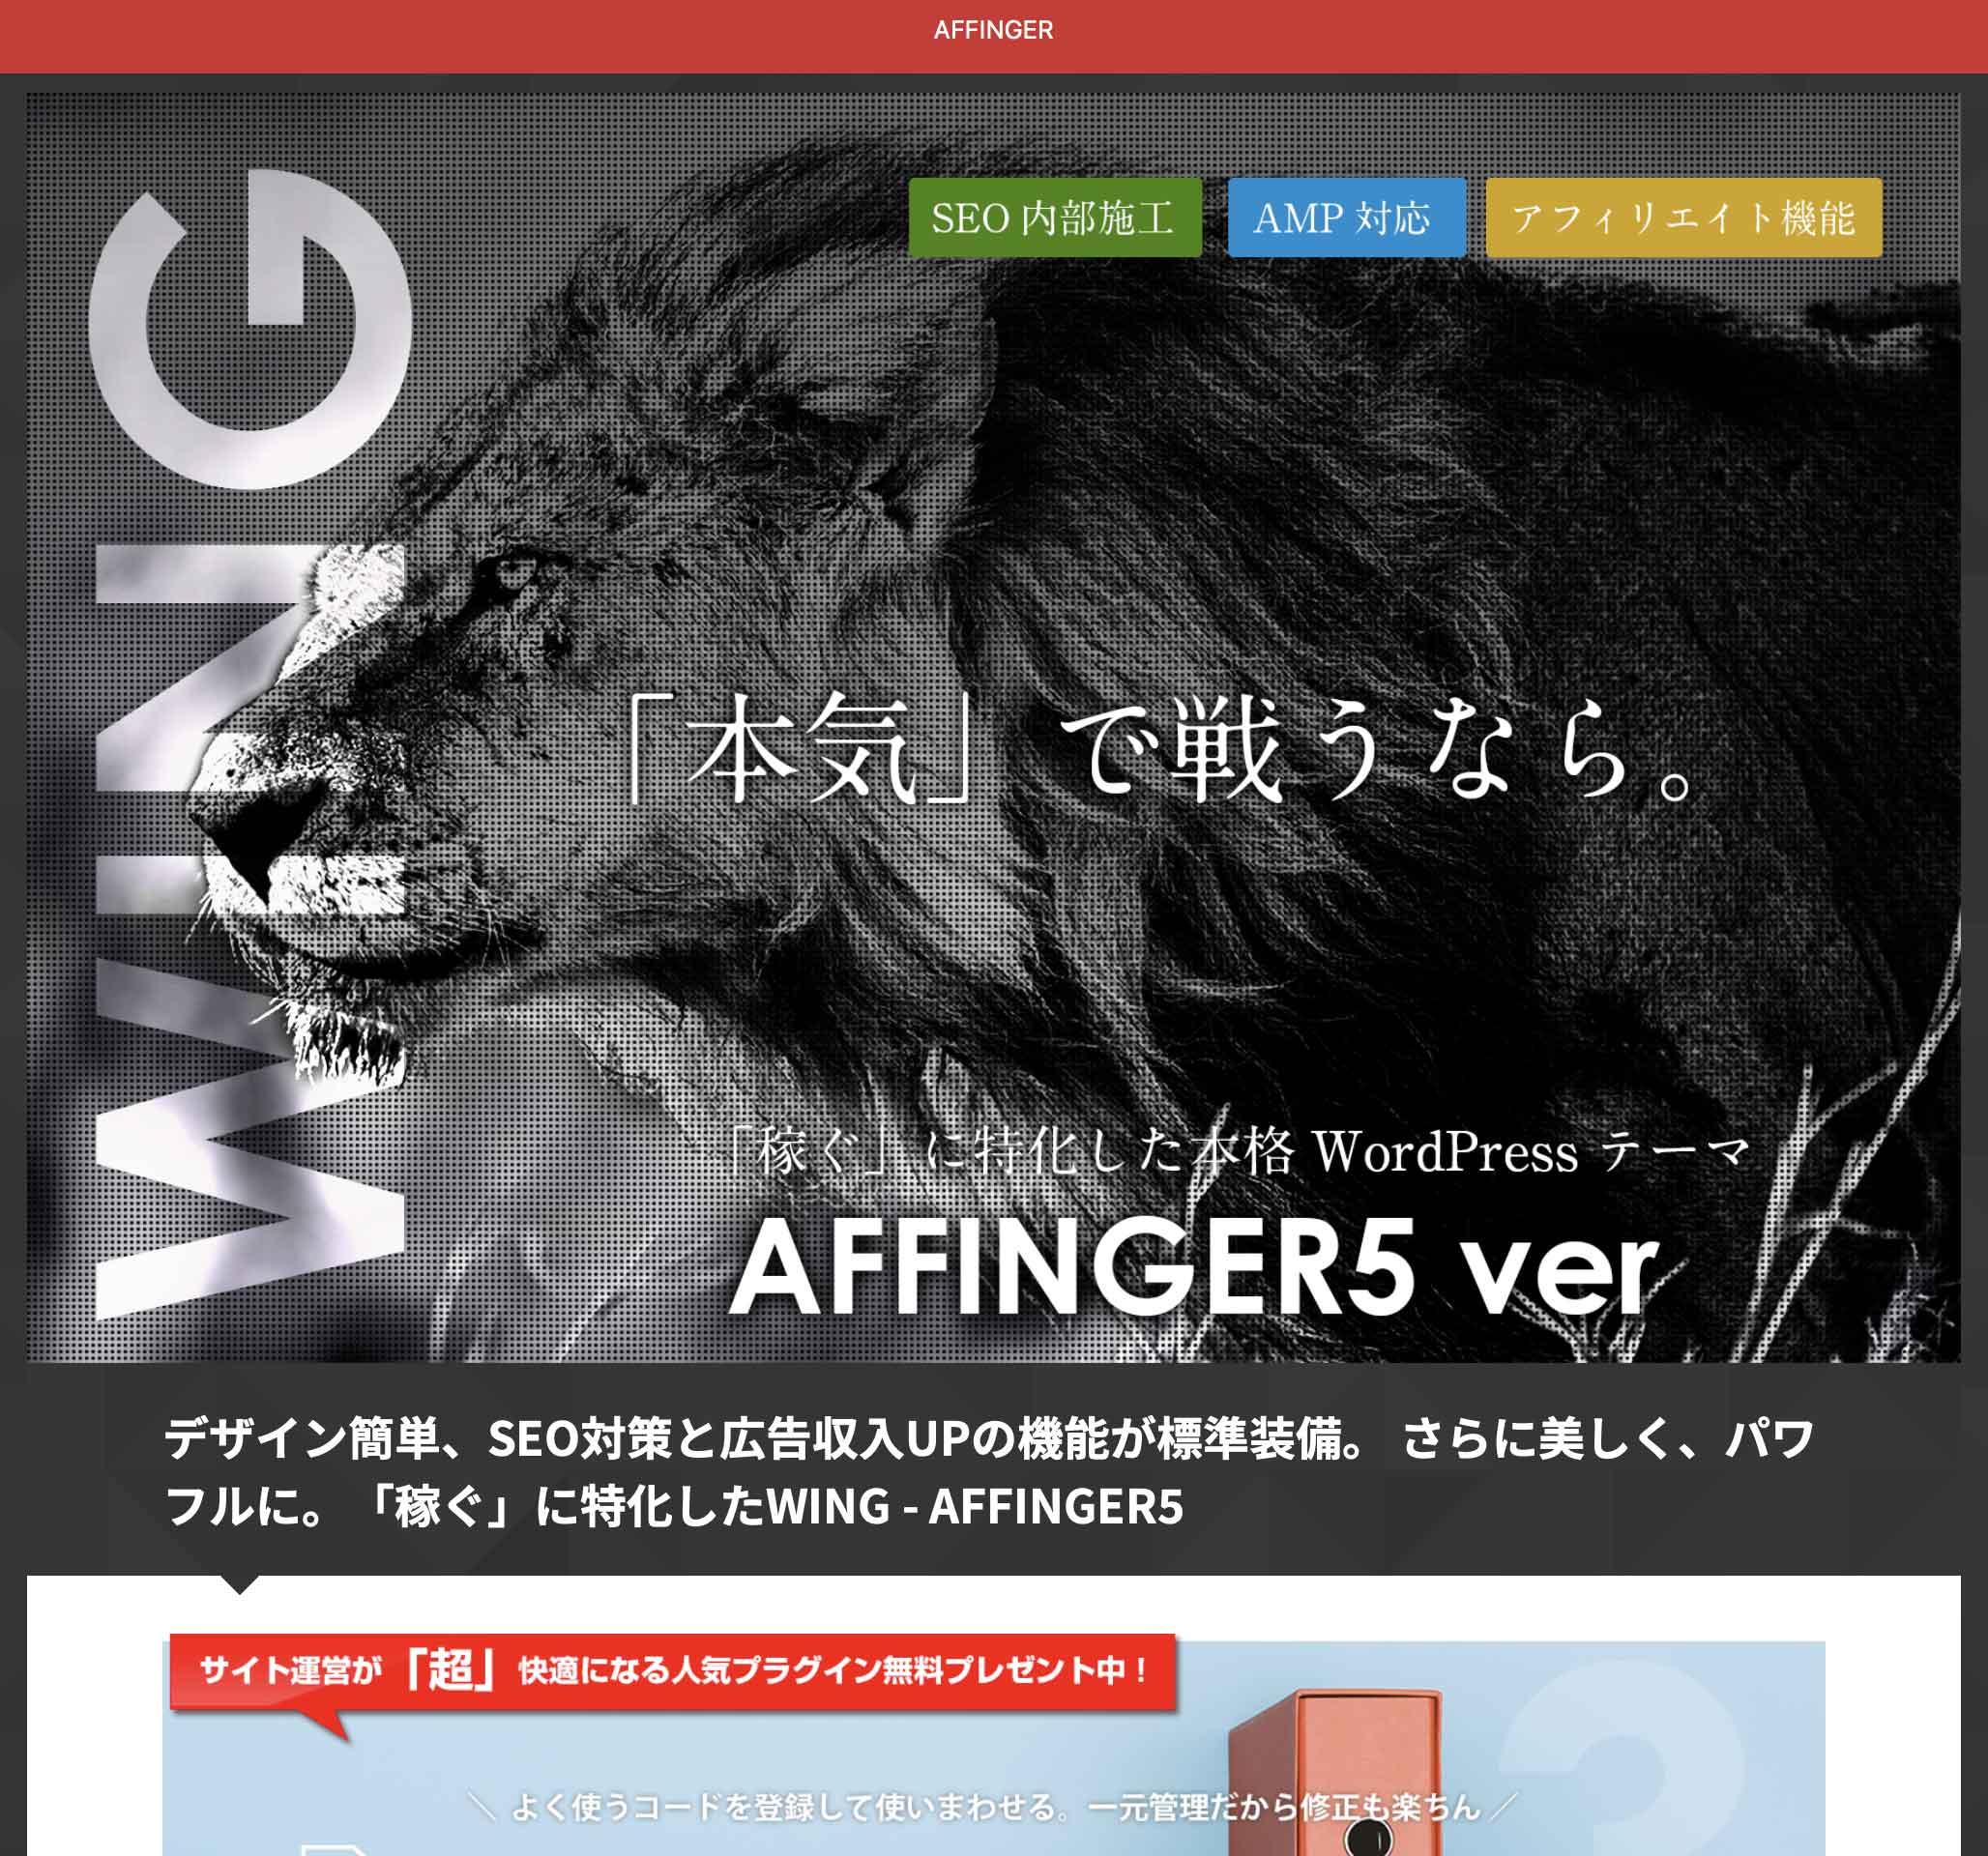 AFFINGER5 トップ